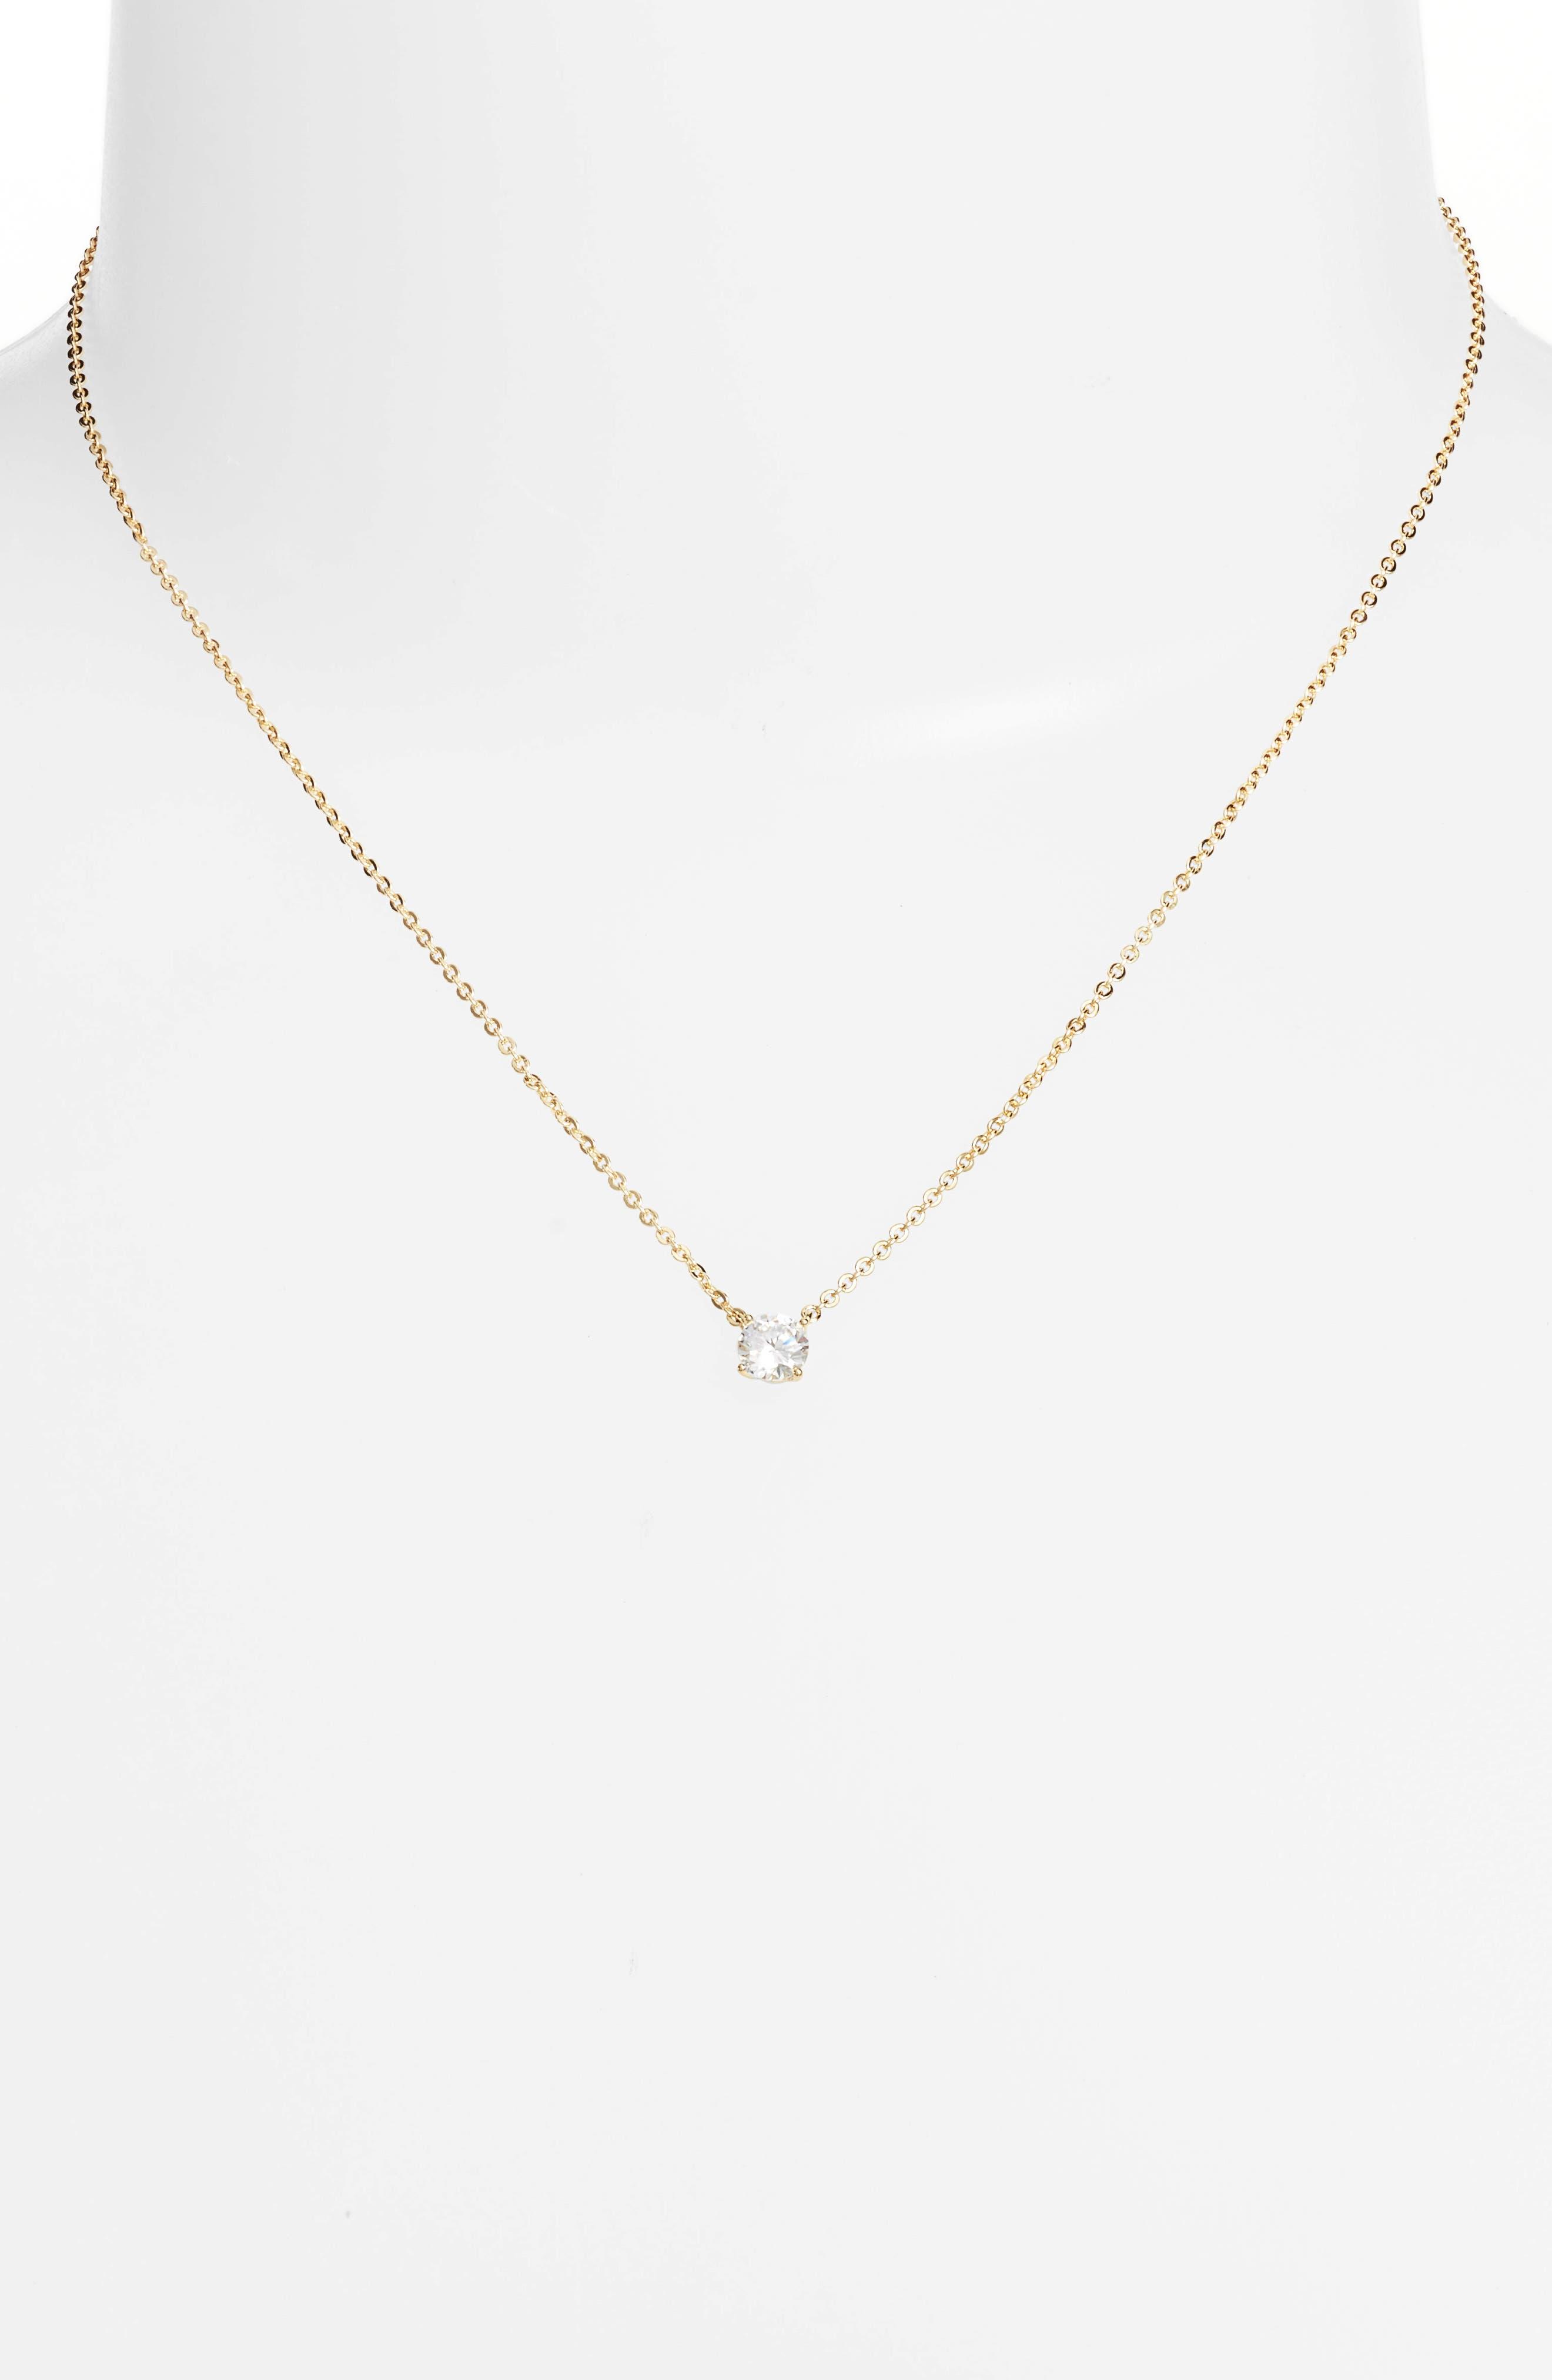 Cubic Zirconia Pendant Necklace,                             Alternate thumbnail 2, color,                             CLEAR- GOLD